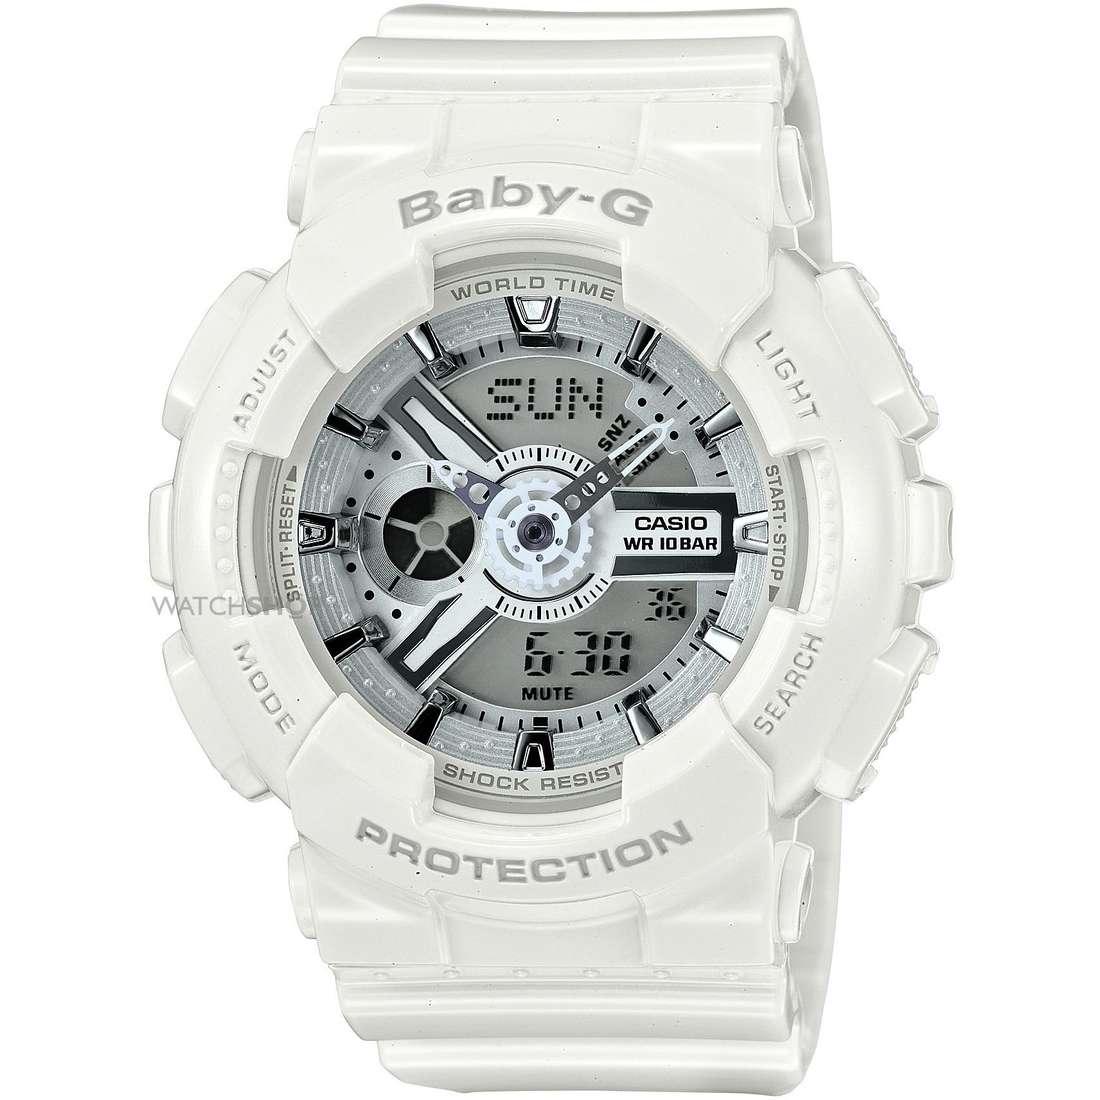 orologio multifunzione unisex Casio BABY-G BA-110-7A3ER